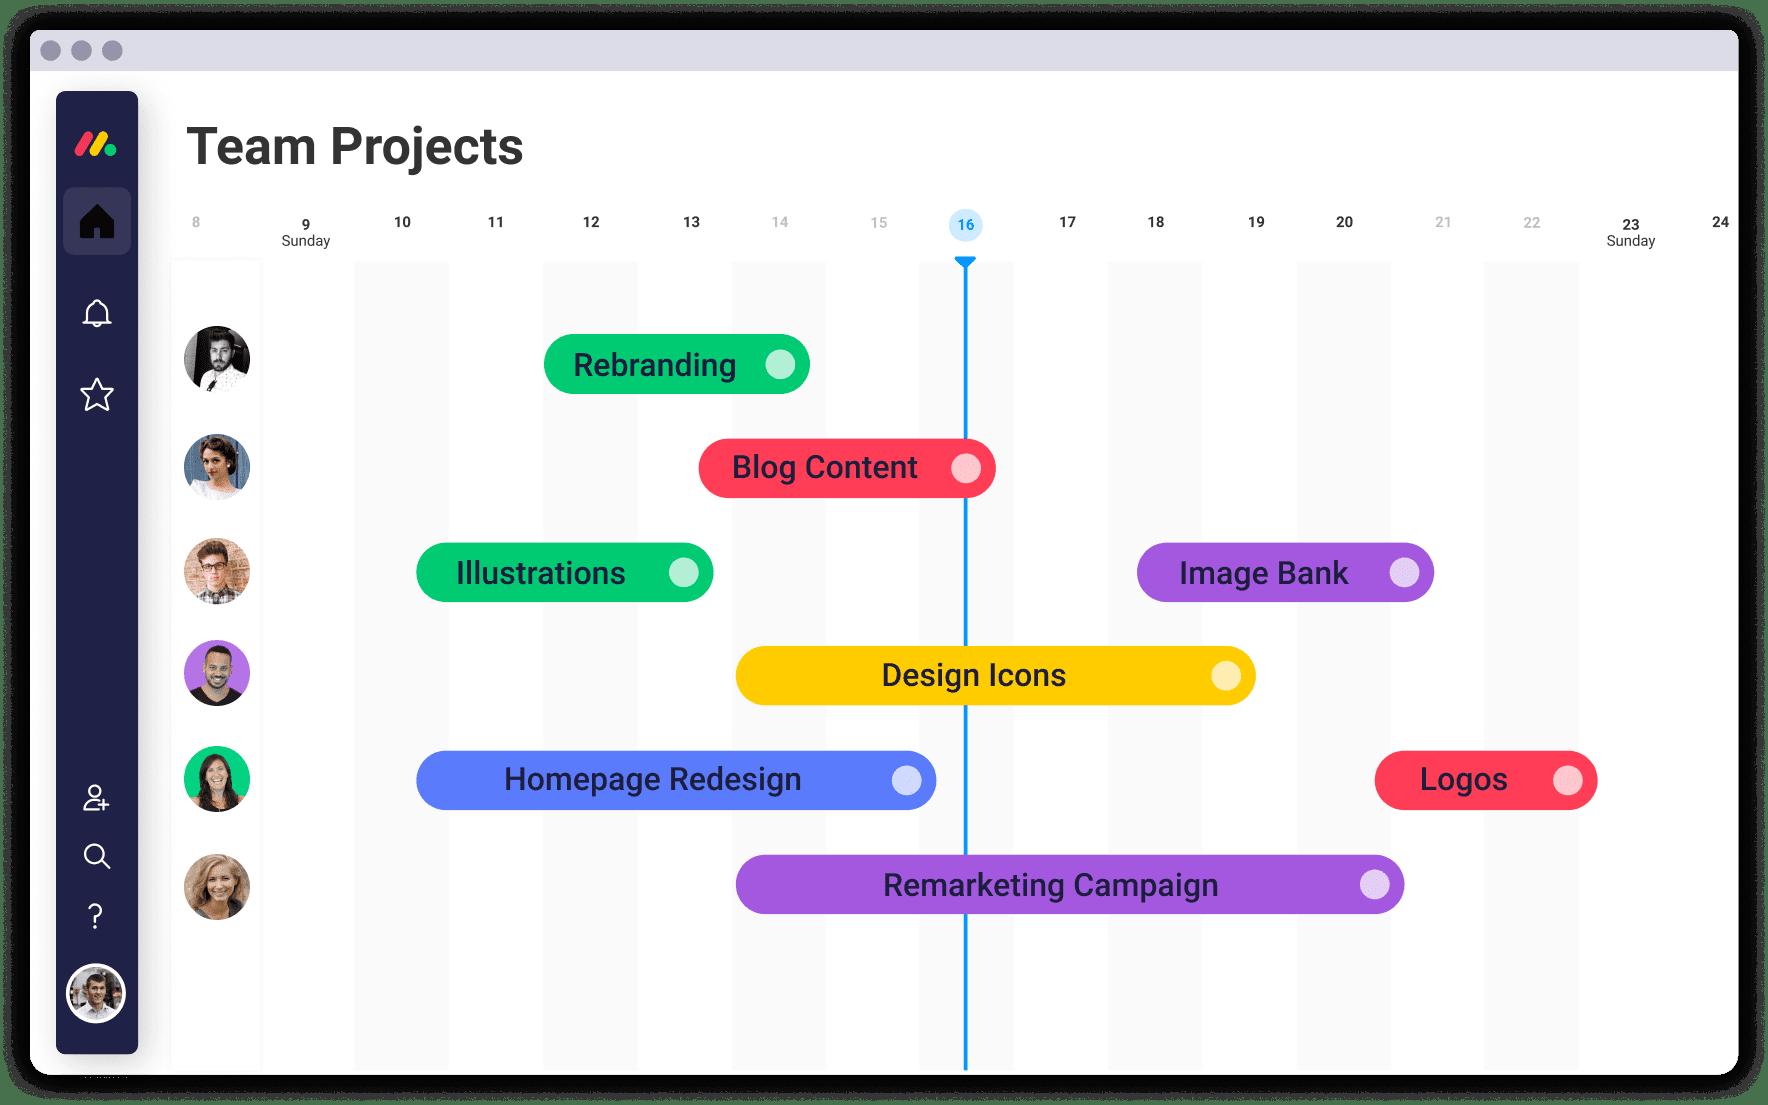 monday.com Gantt chart view showing team projects